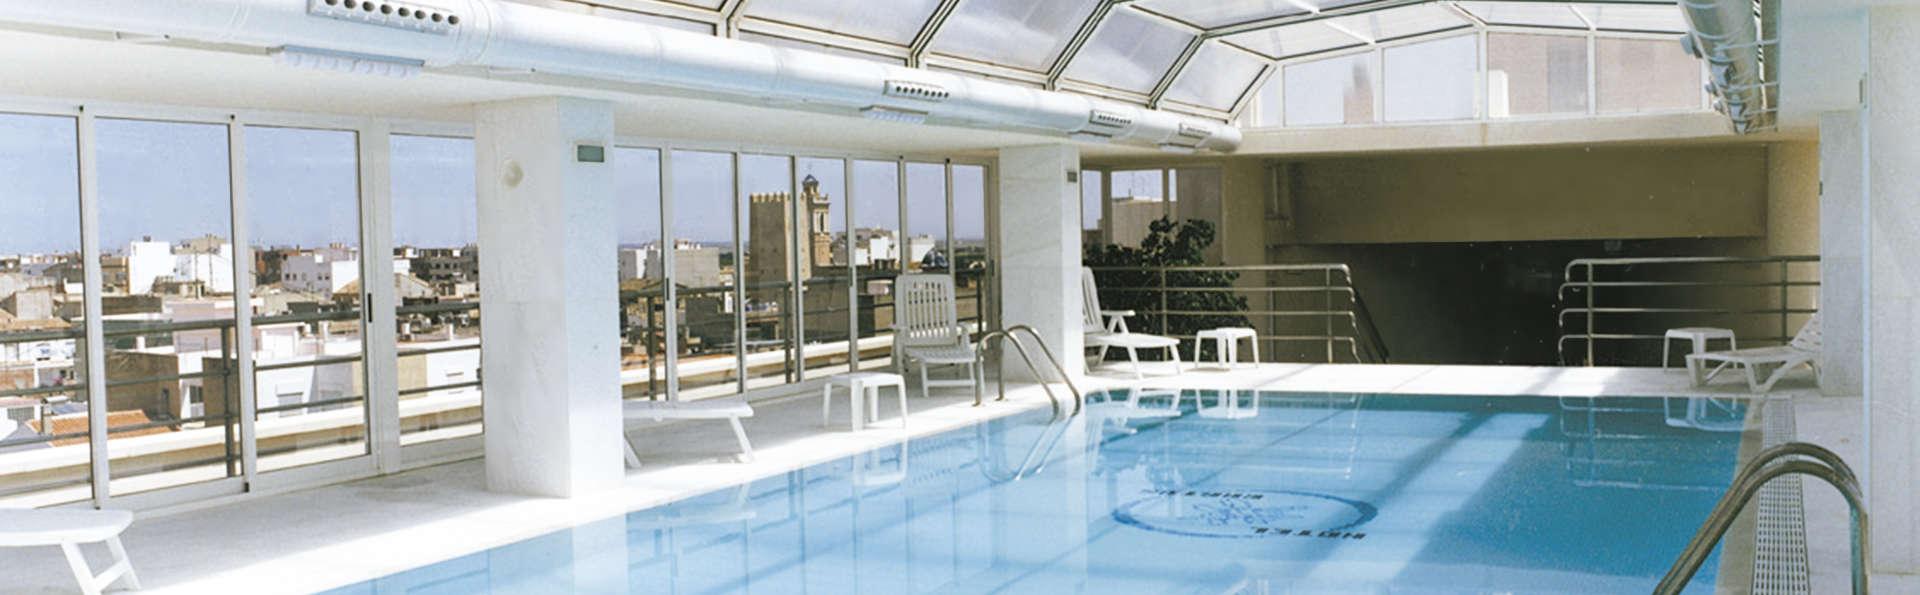 Hotel Bartos - EDIT_inpool.jpg